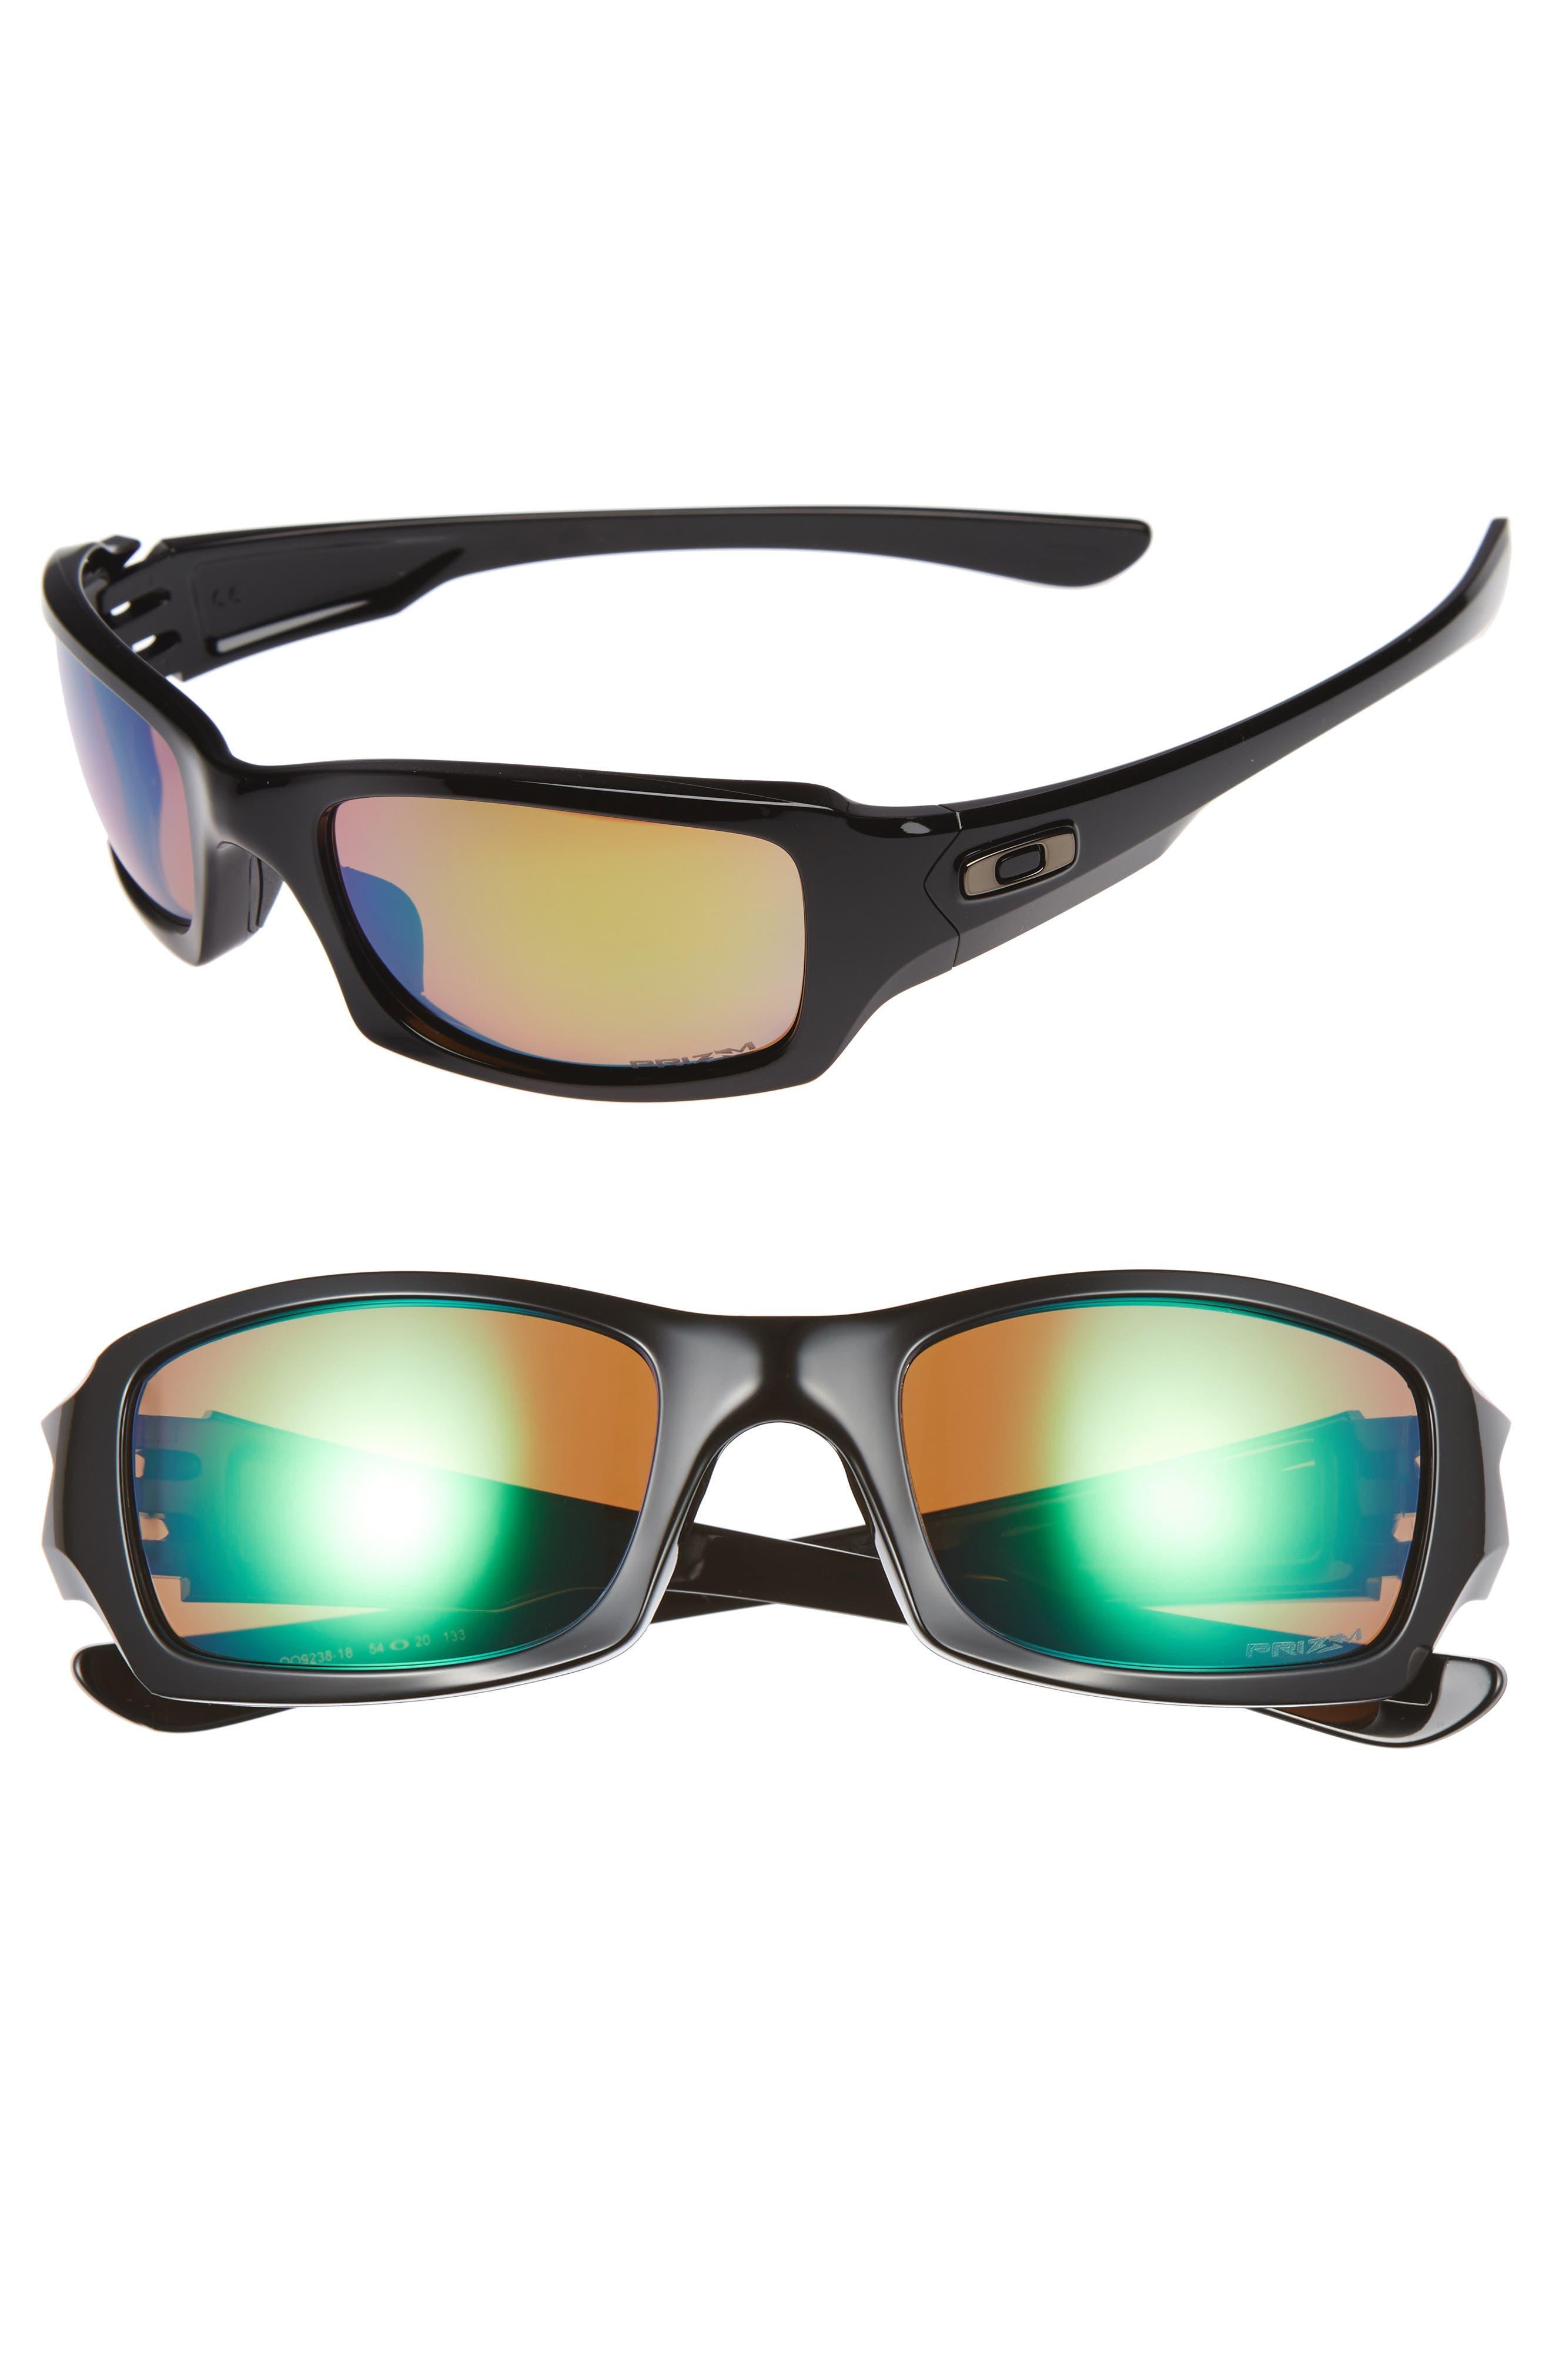 Oakley Fives Squared H2O 5m Polarized Sunglasses -